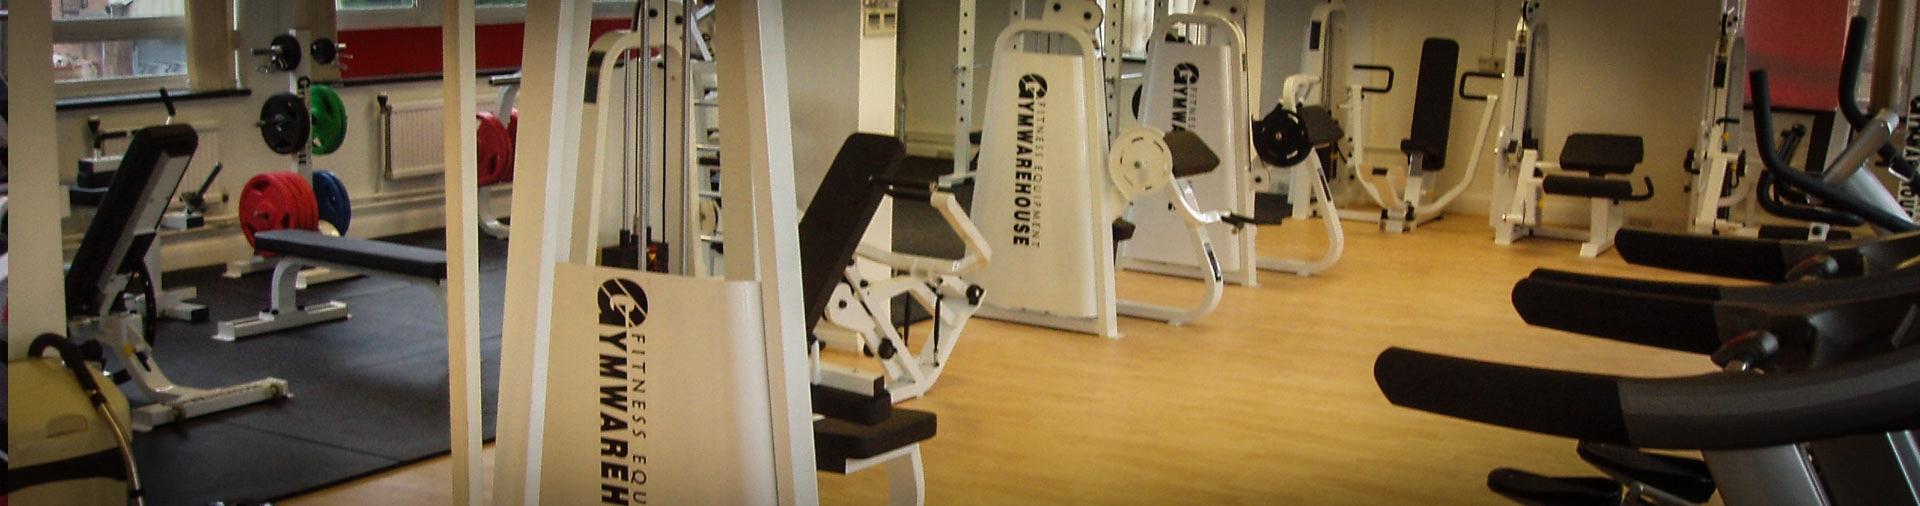 Gym Warehouse (@gymwarehouse) Cover Image